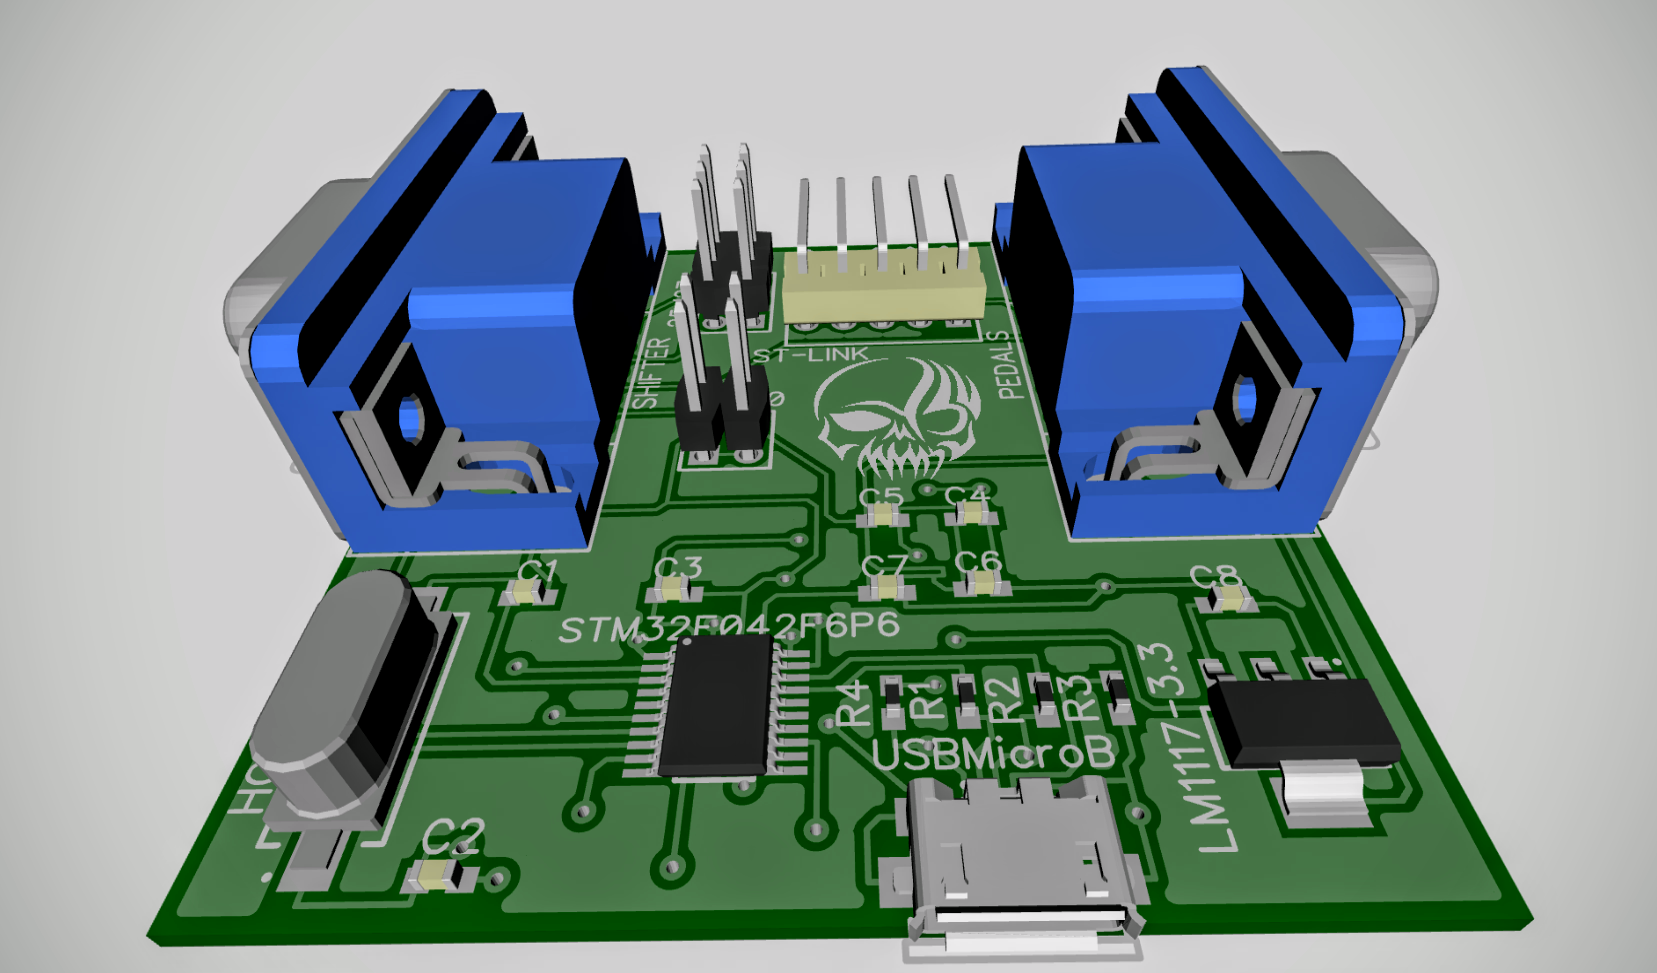 Адаптер педалей и/или шифтера Logitech G25/G27 на STM32